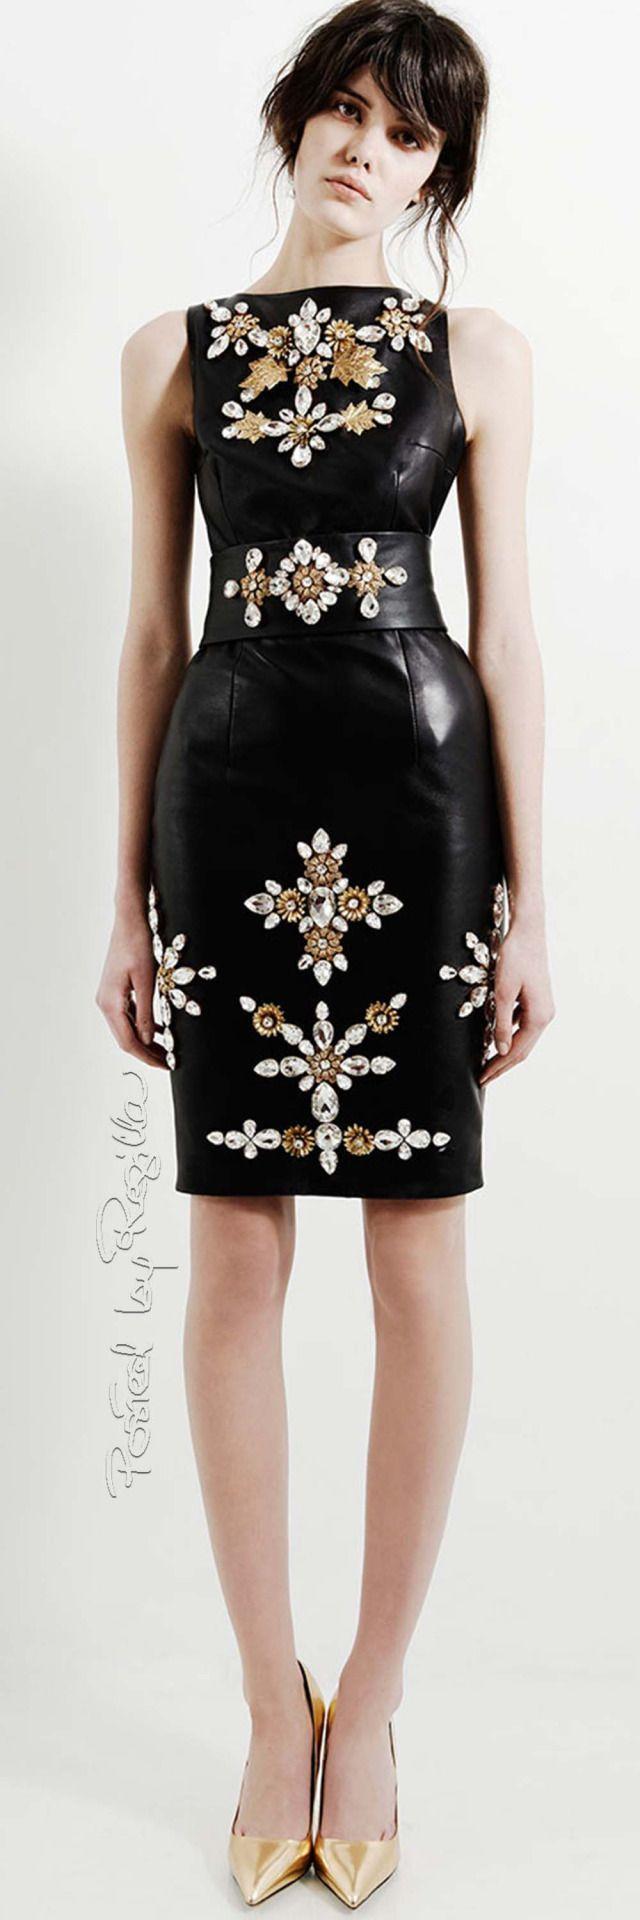 Regilla stefano de lellis looking good pinterest haute couture